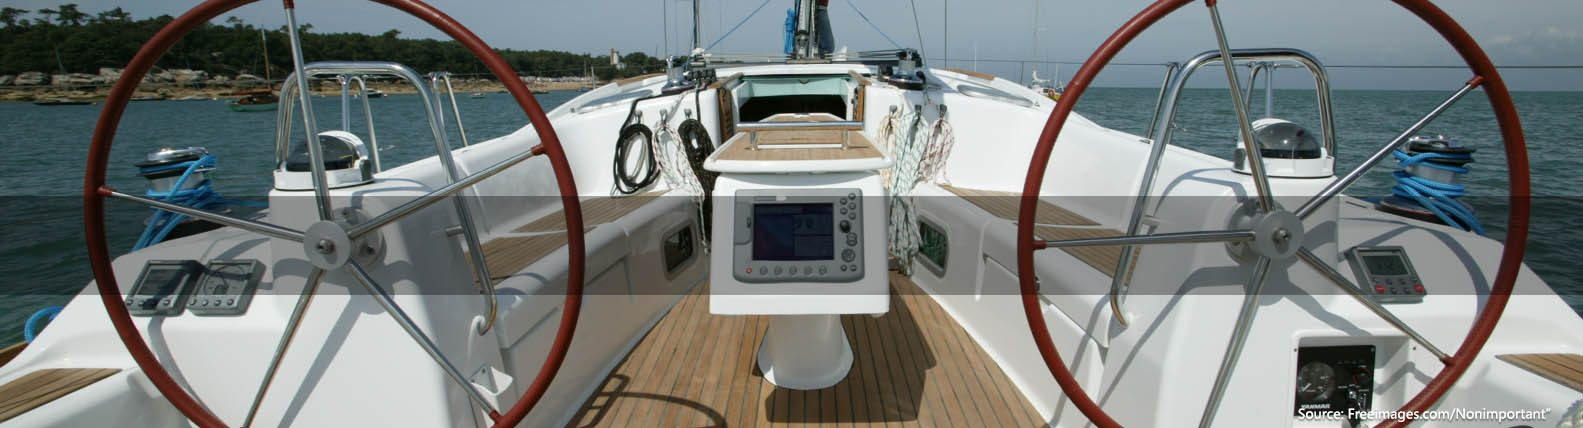 Nautics, Yachts & Sailboats